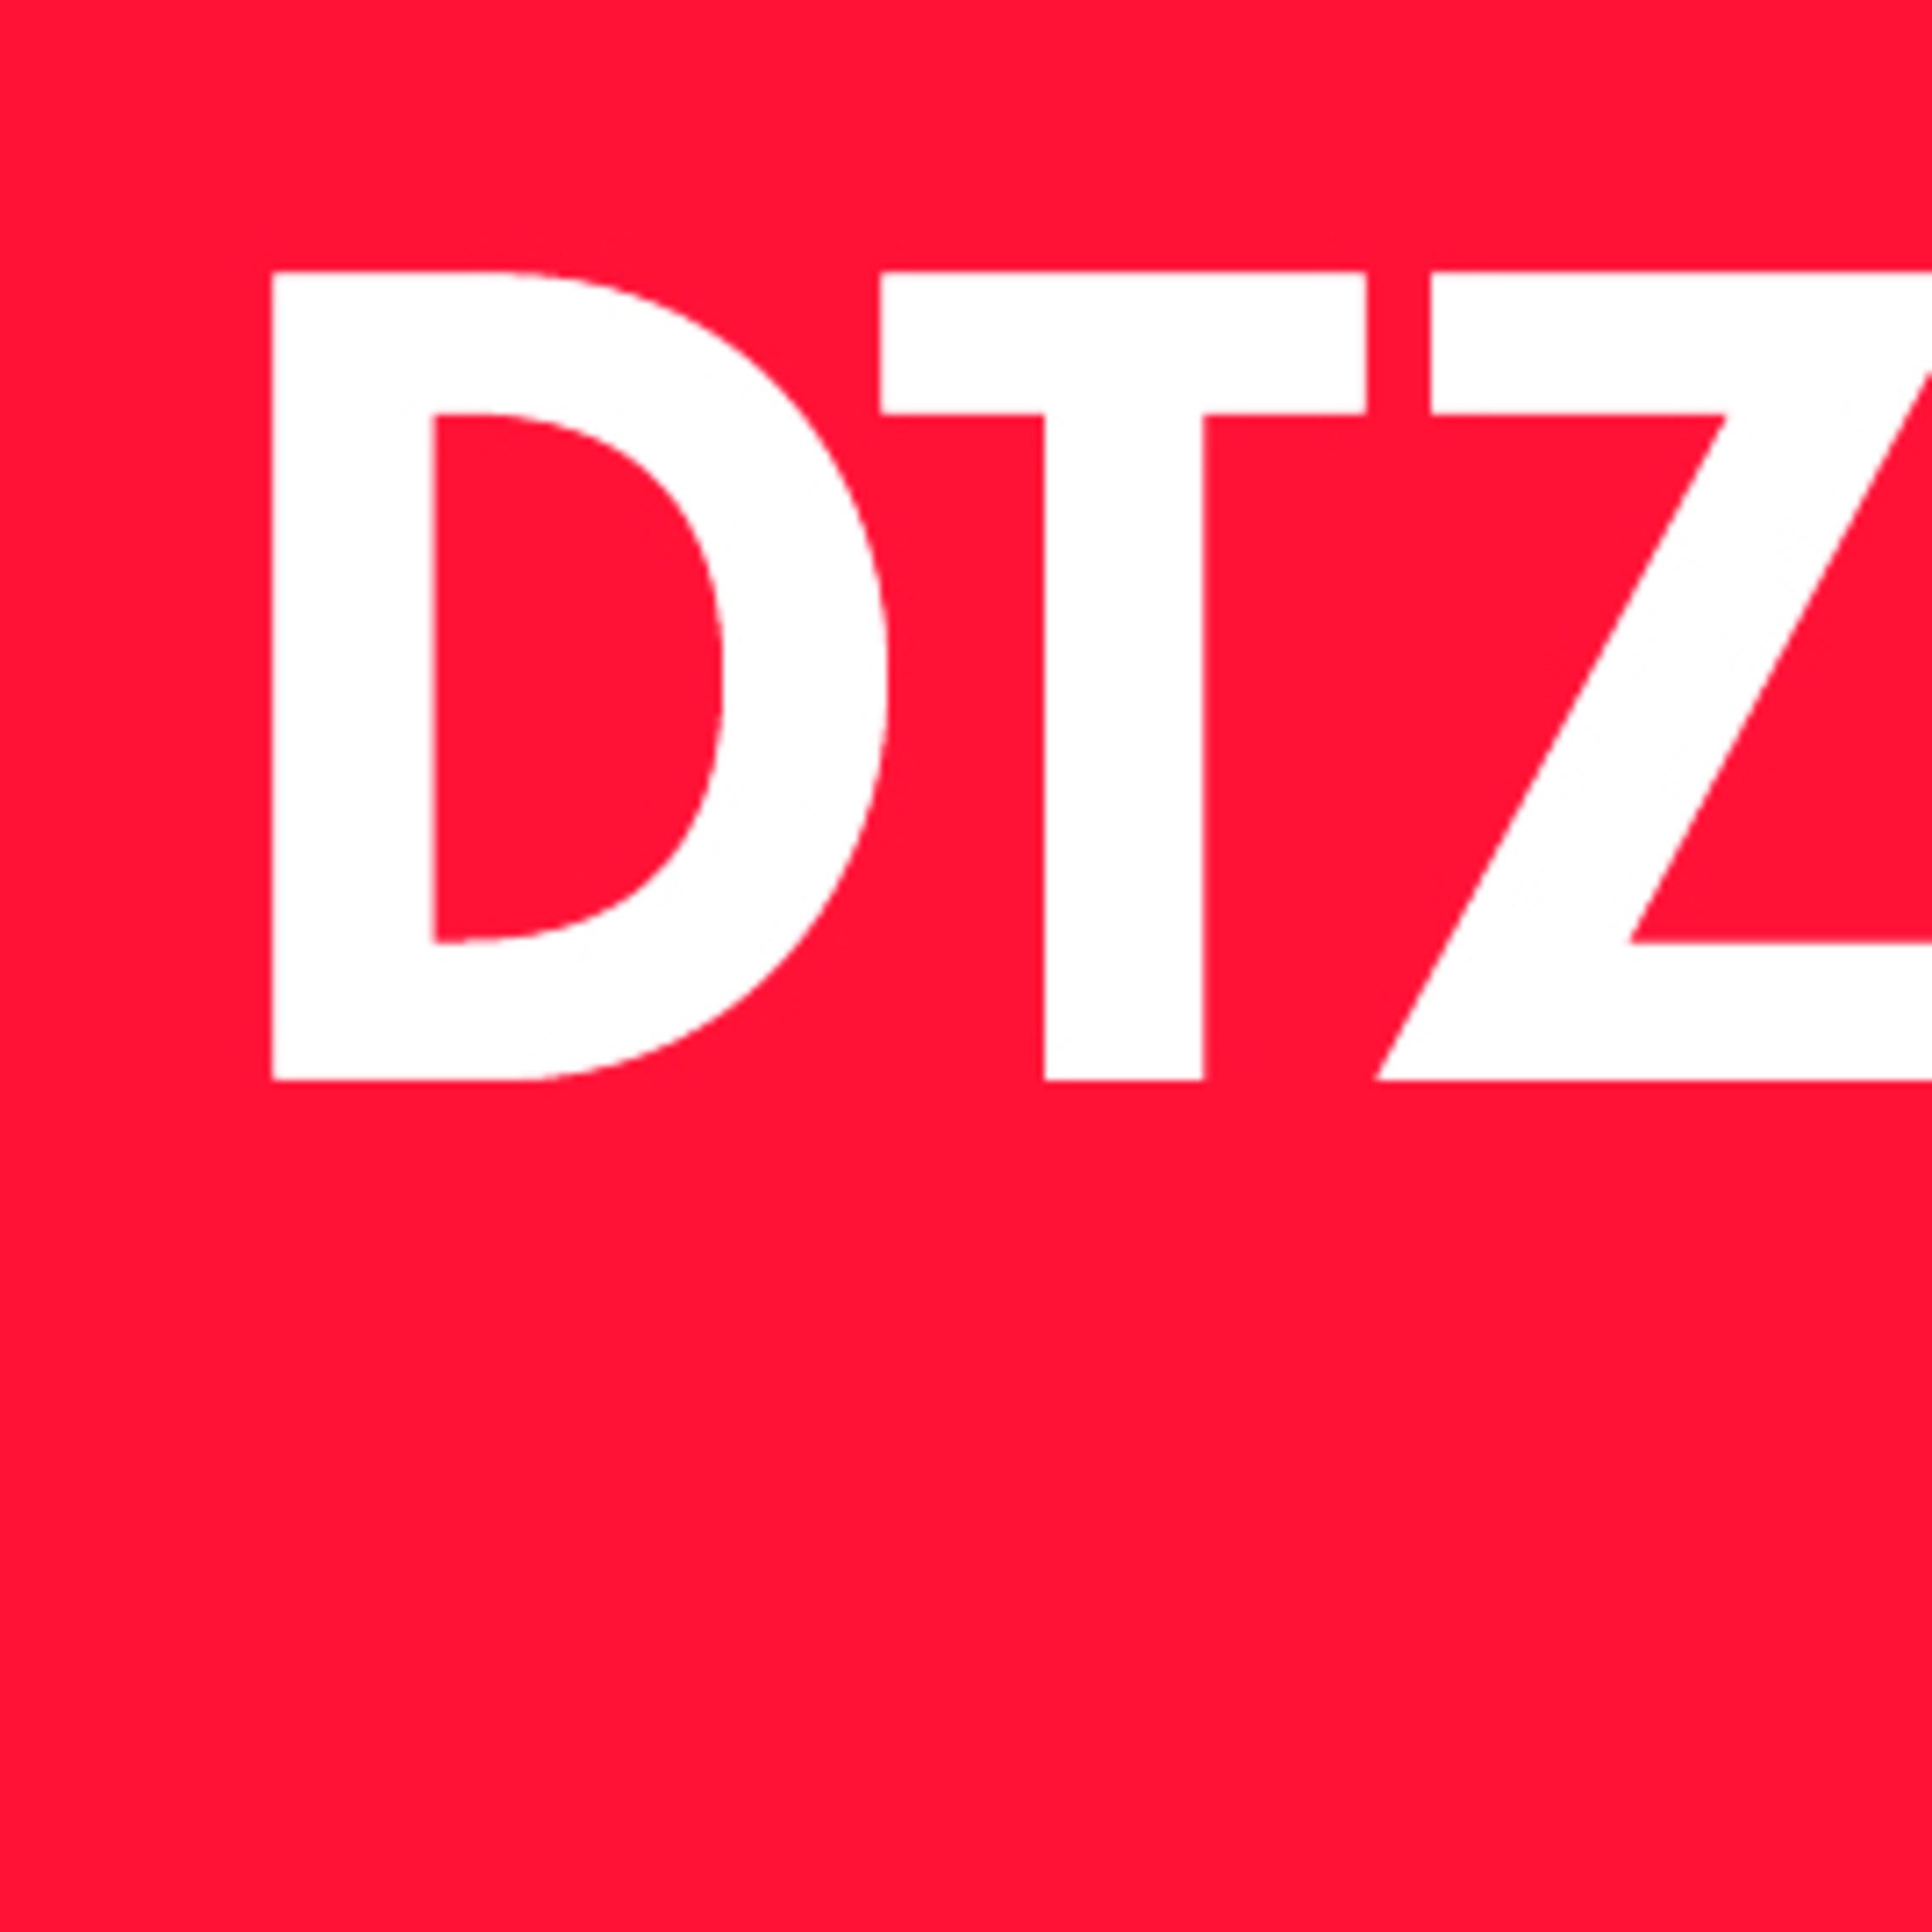 dtz property network- company logo